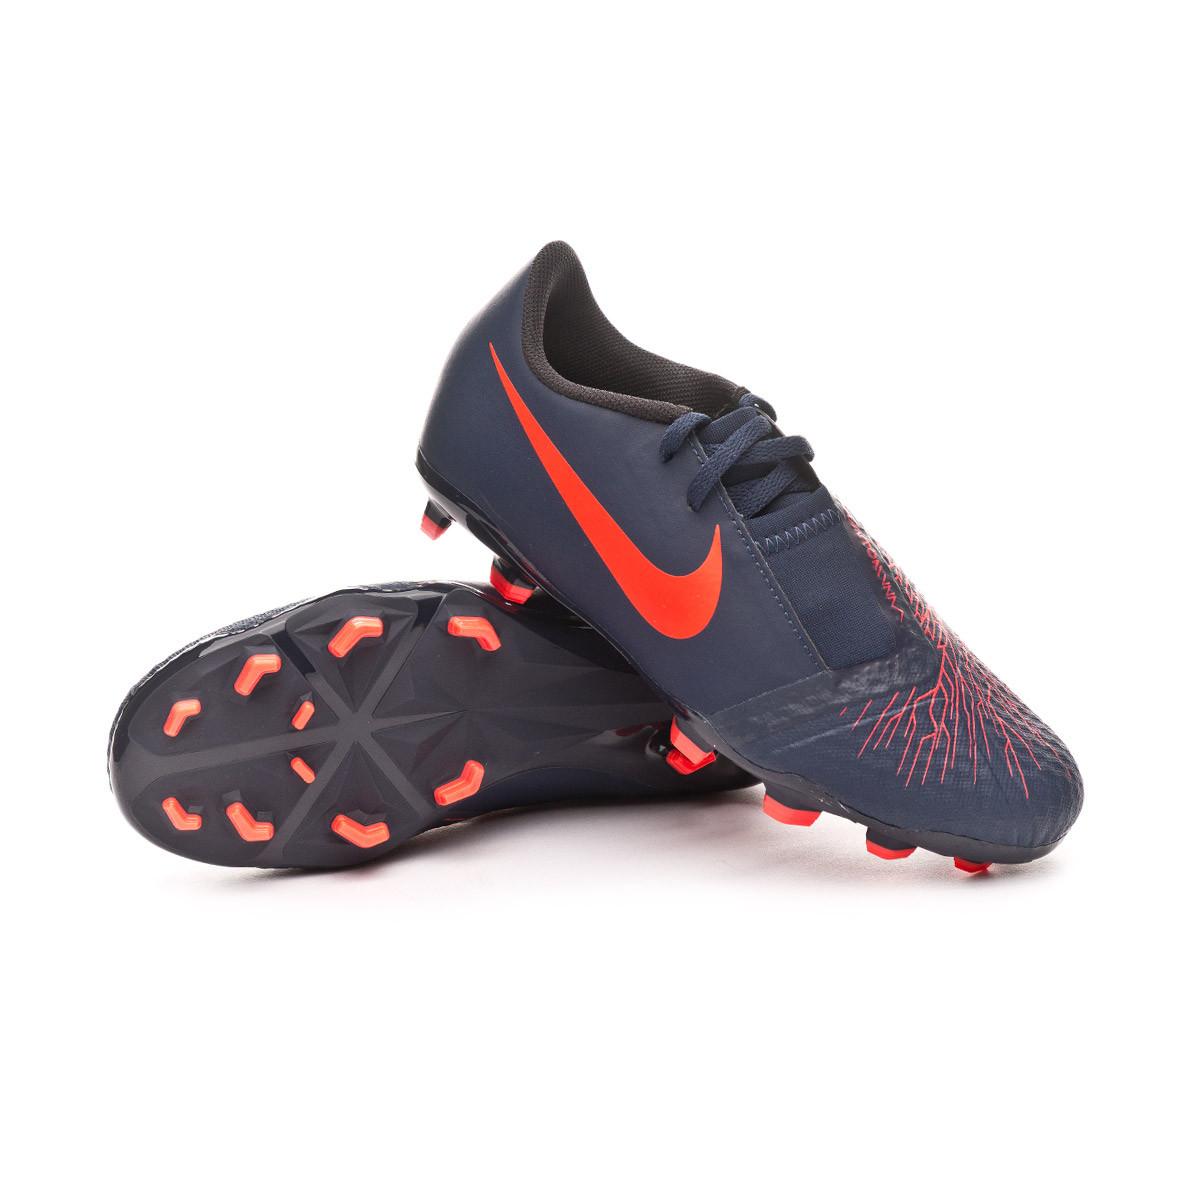 6a7ef63bbe7 Football Boots Nike Kids Phantom Venom Academy FG Obsidian-White ...